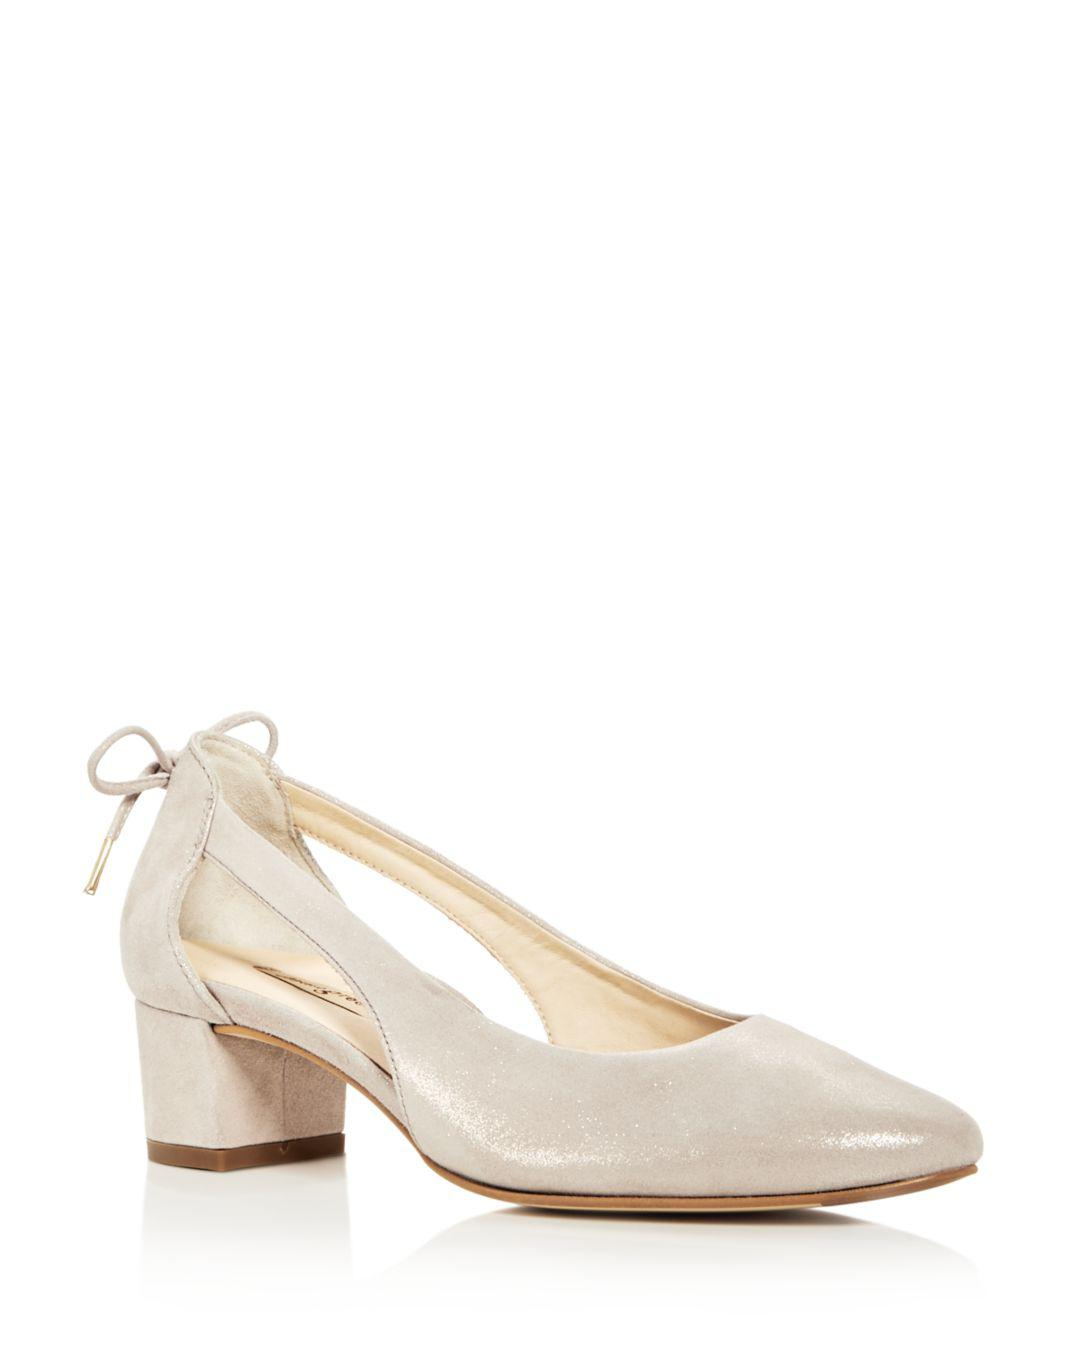 49b9a6fe37 Paul Green Women's Paulina Nubuck Leather D'orsay Block Heel Pumps ...